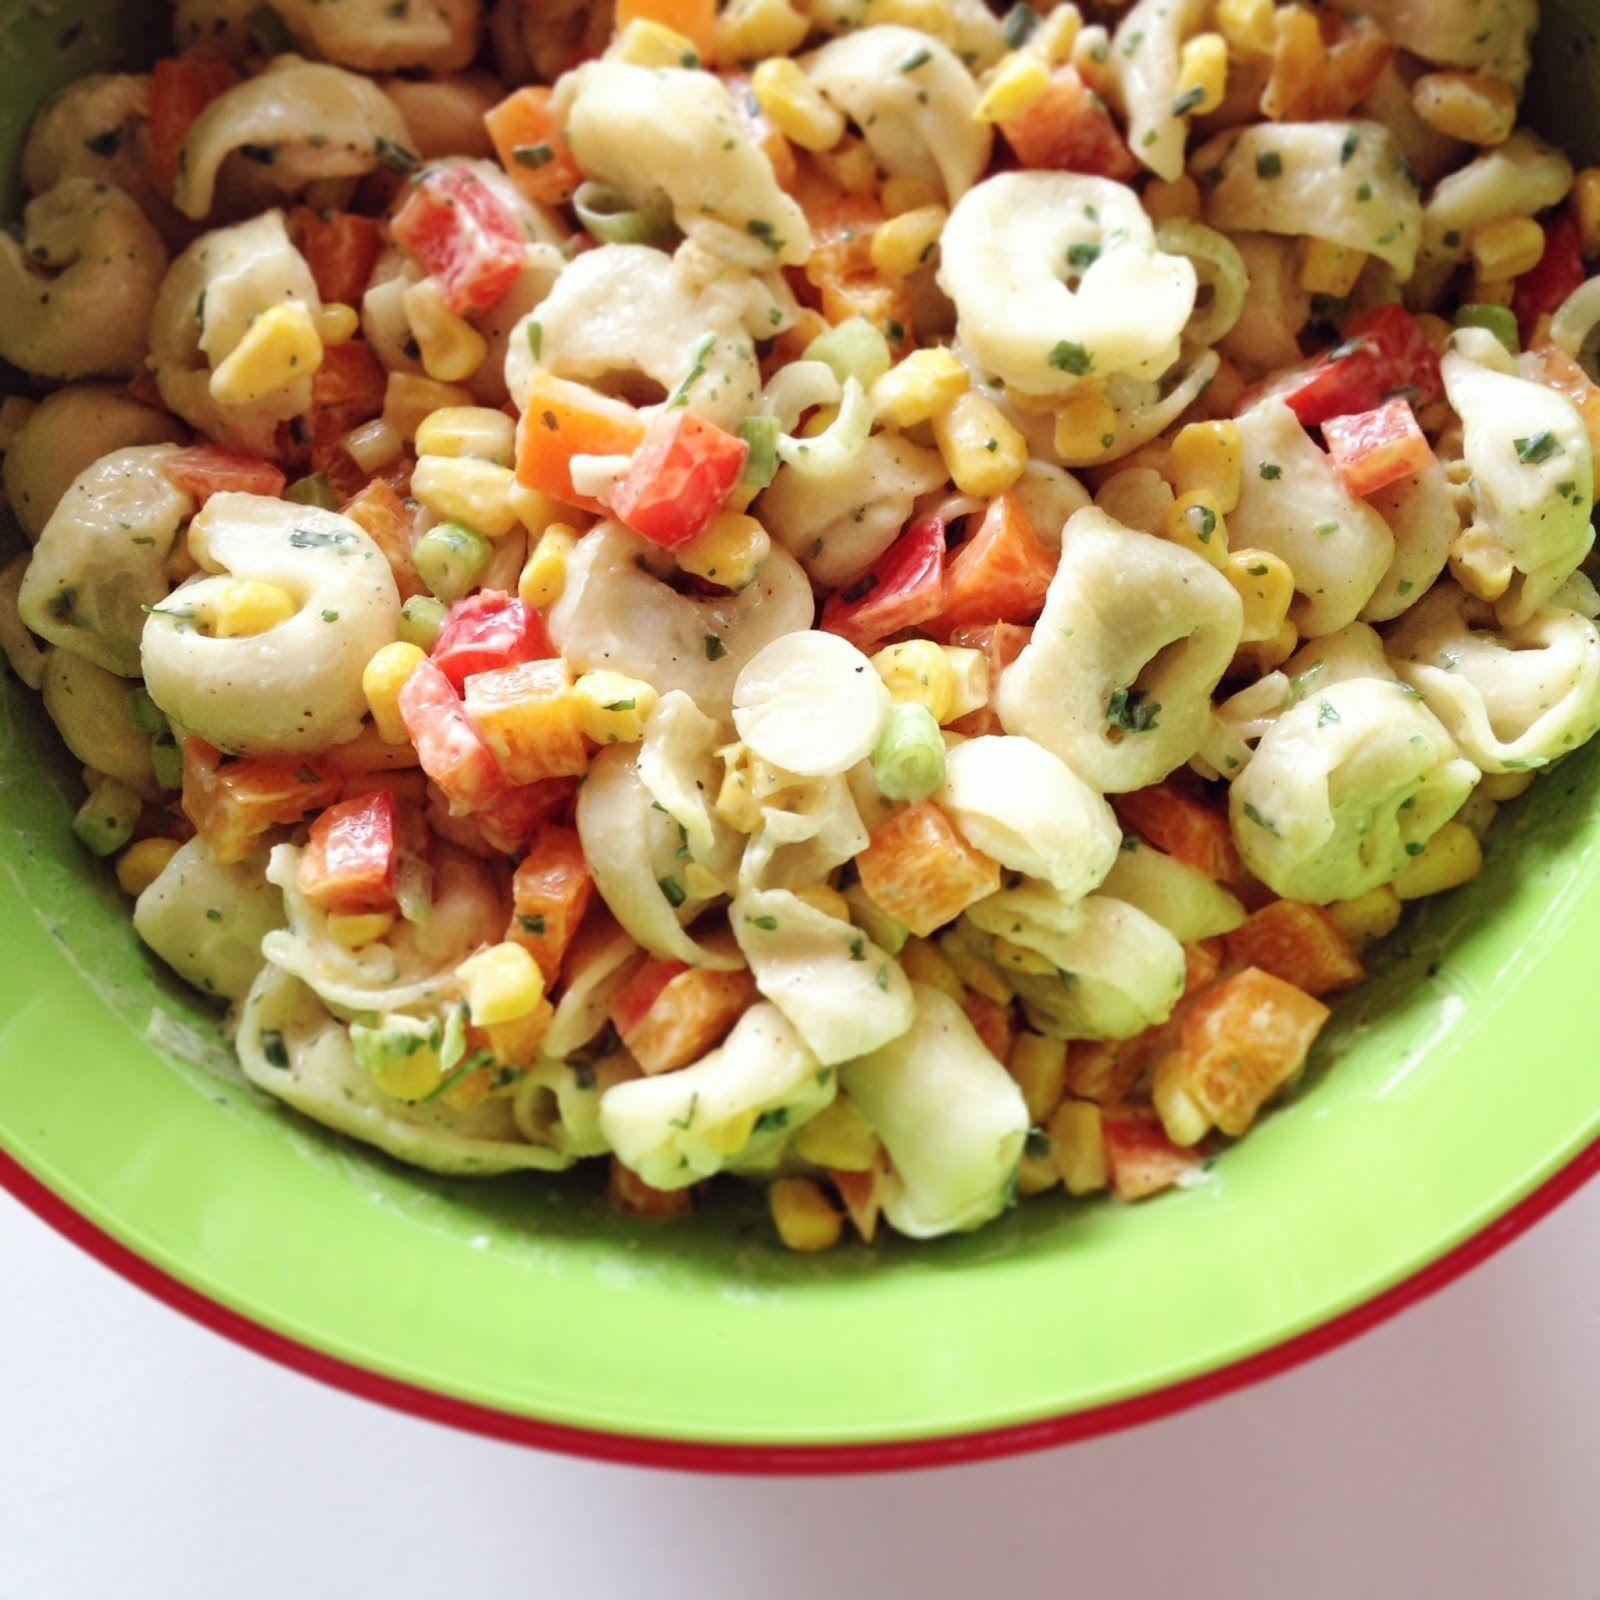 m dchenkram gegessen tortellini salat rezept vegan vegetarisch vegan pinterest. Black Bedroom Furniture Sets. Home Design Ideas